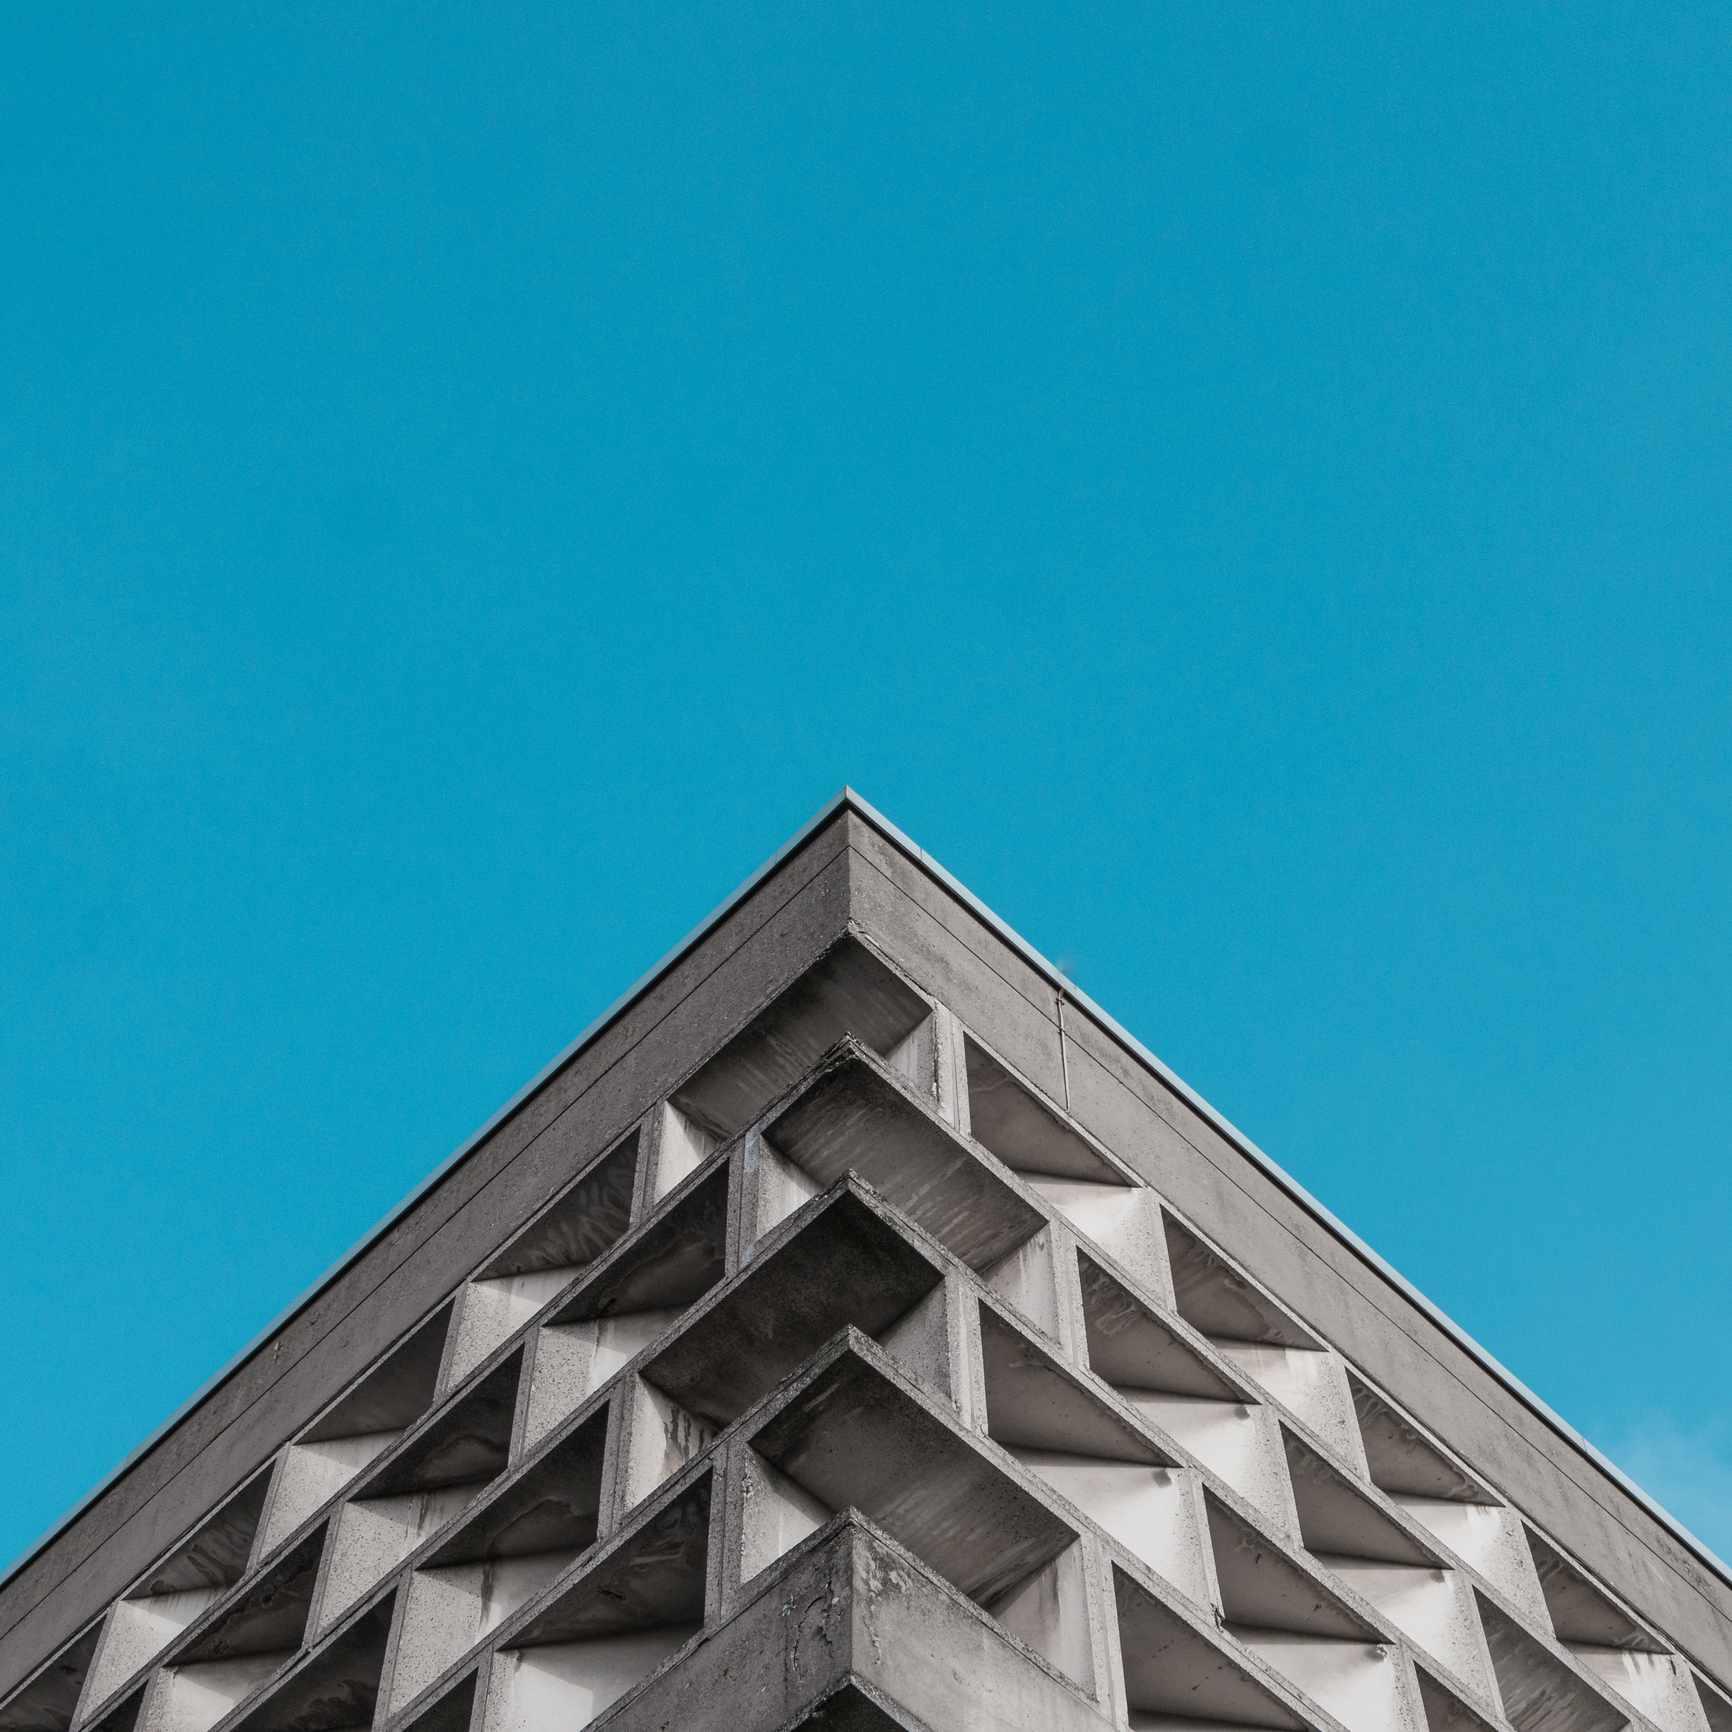 Brutalist building in Cologne, Germany